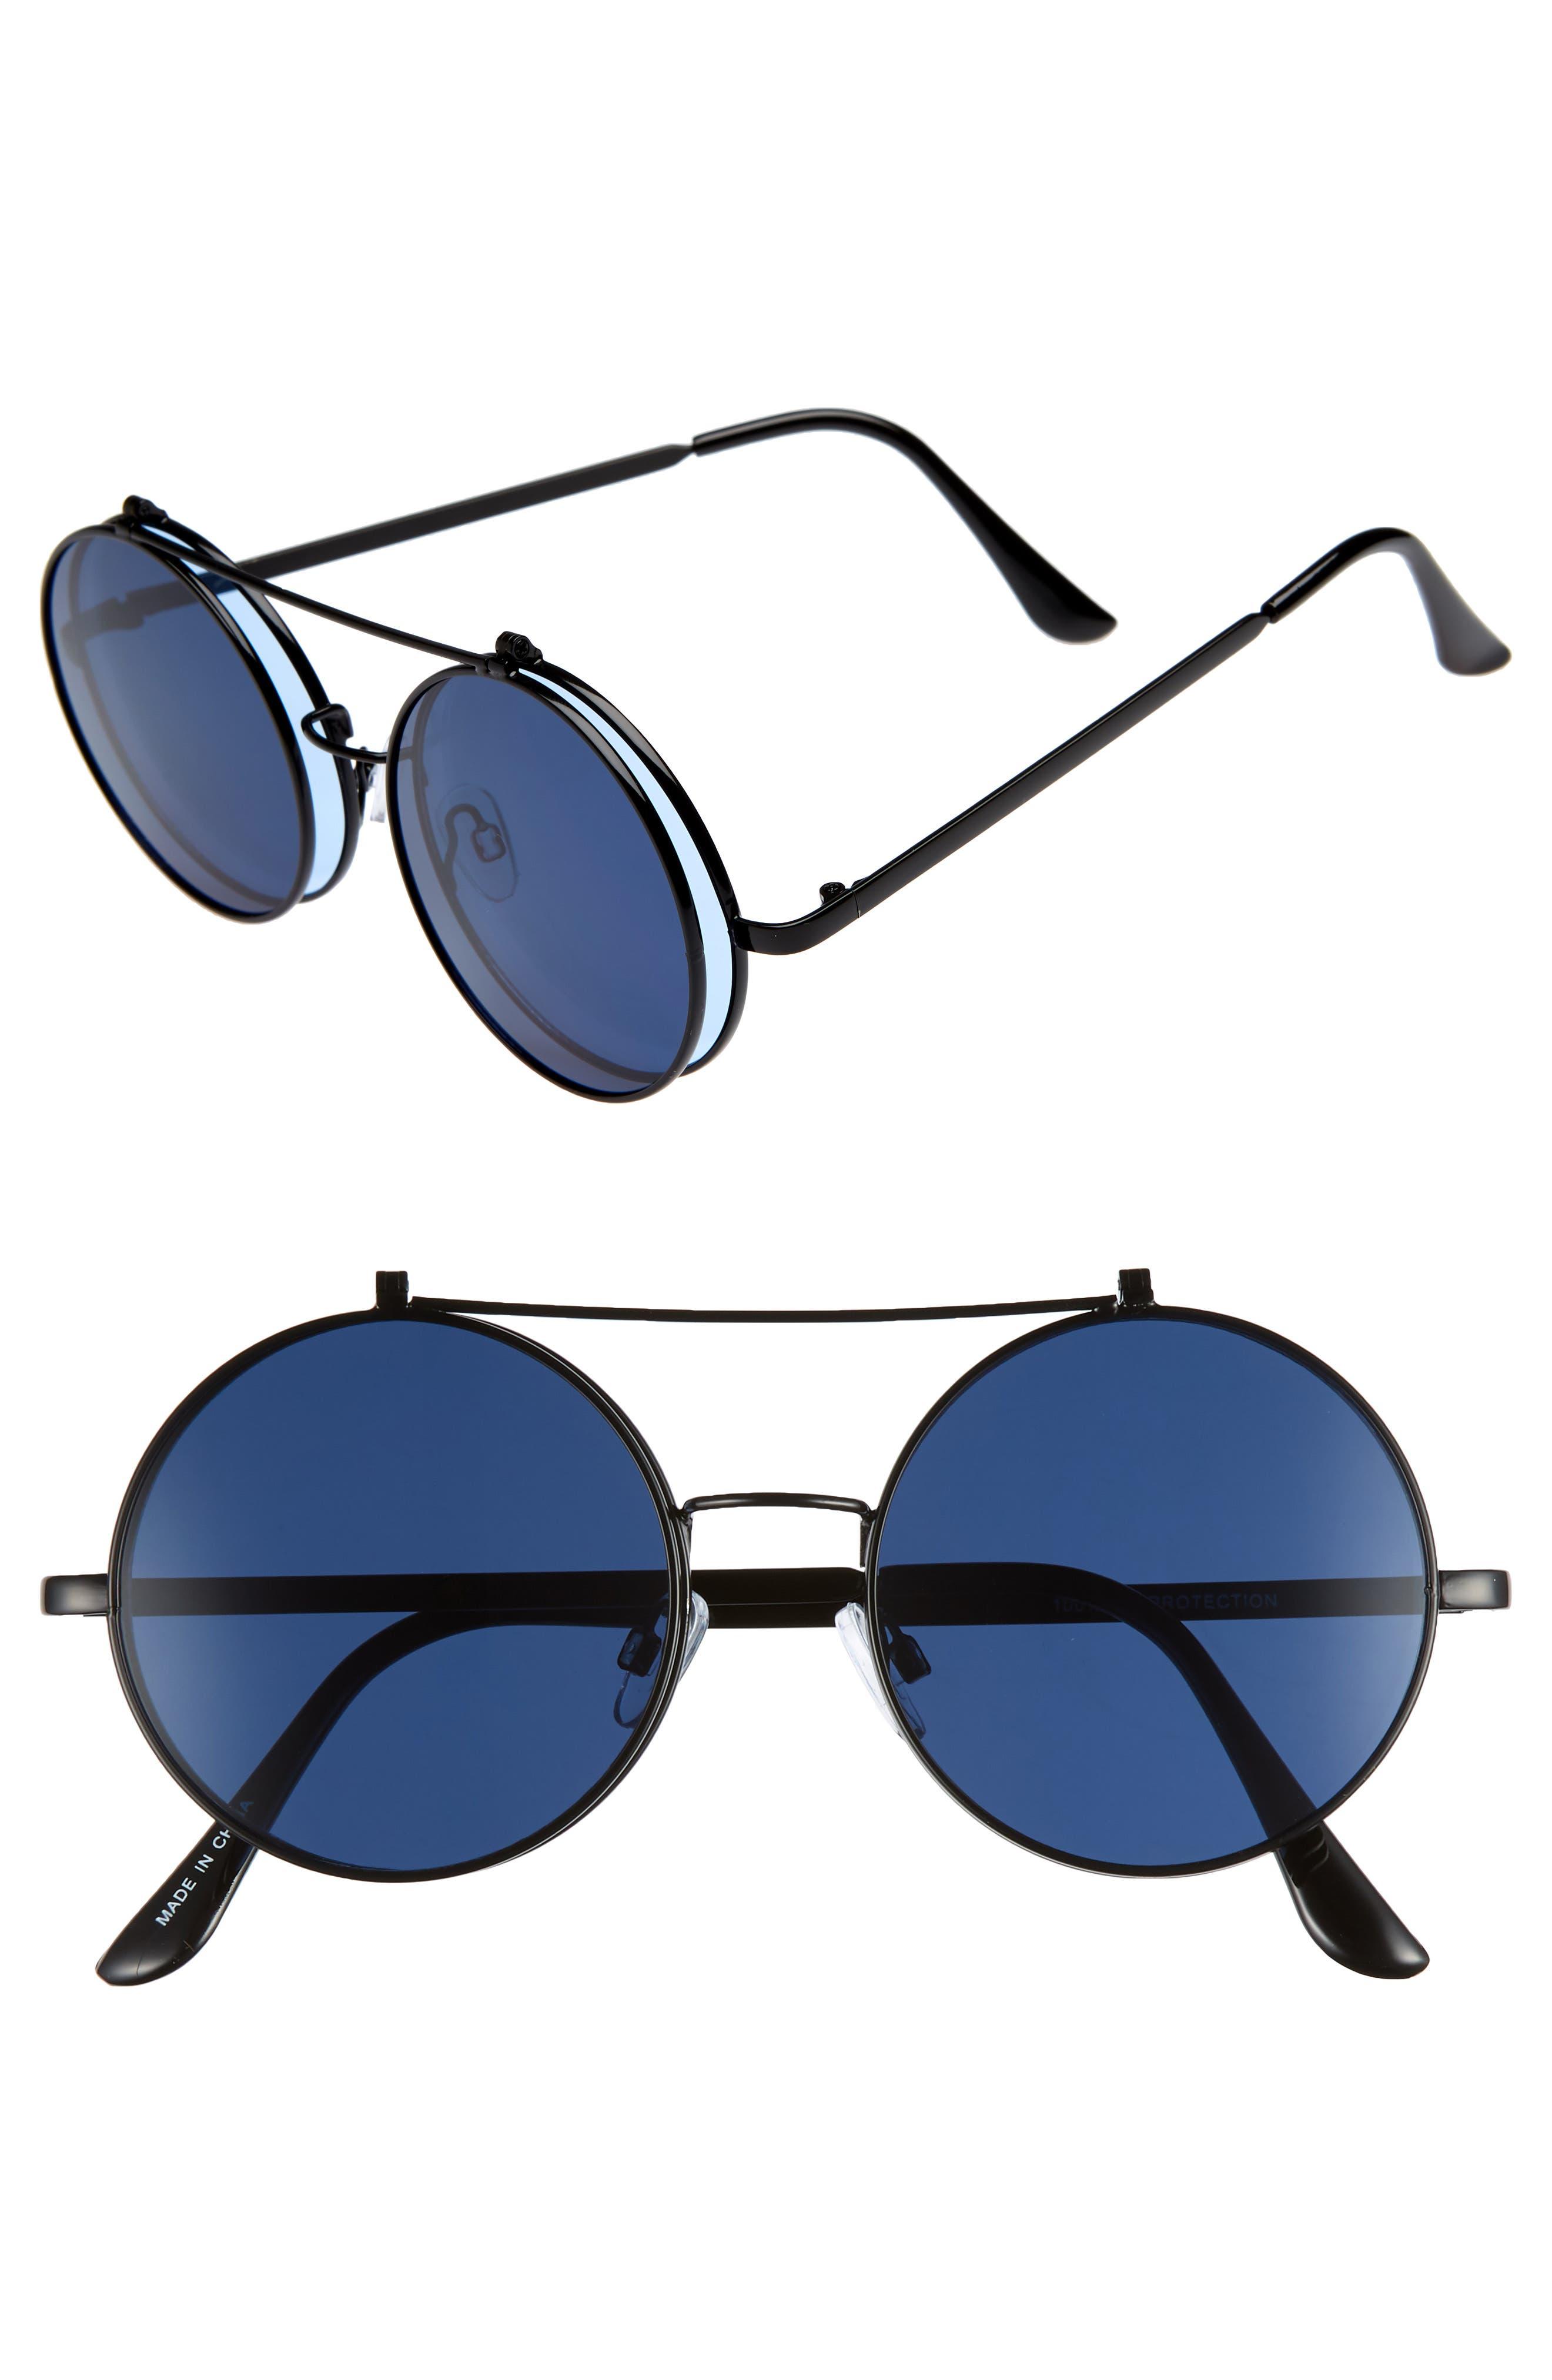 50mm Round Flip-Up Sunglasses,                             Main thumbnail 1, color,                             BLACK/ BLUE